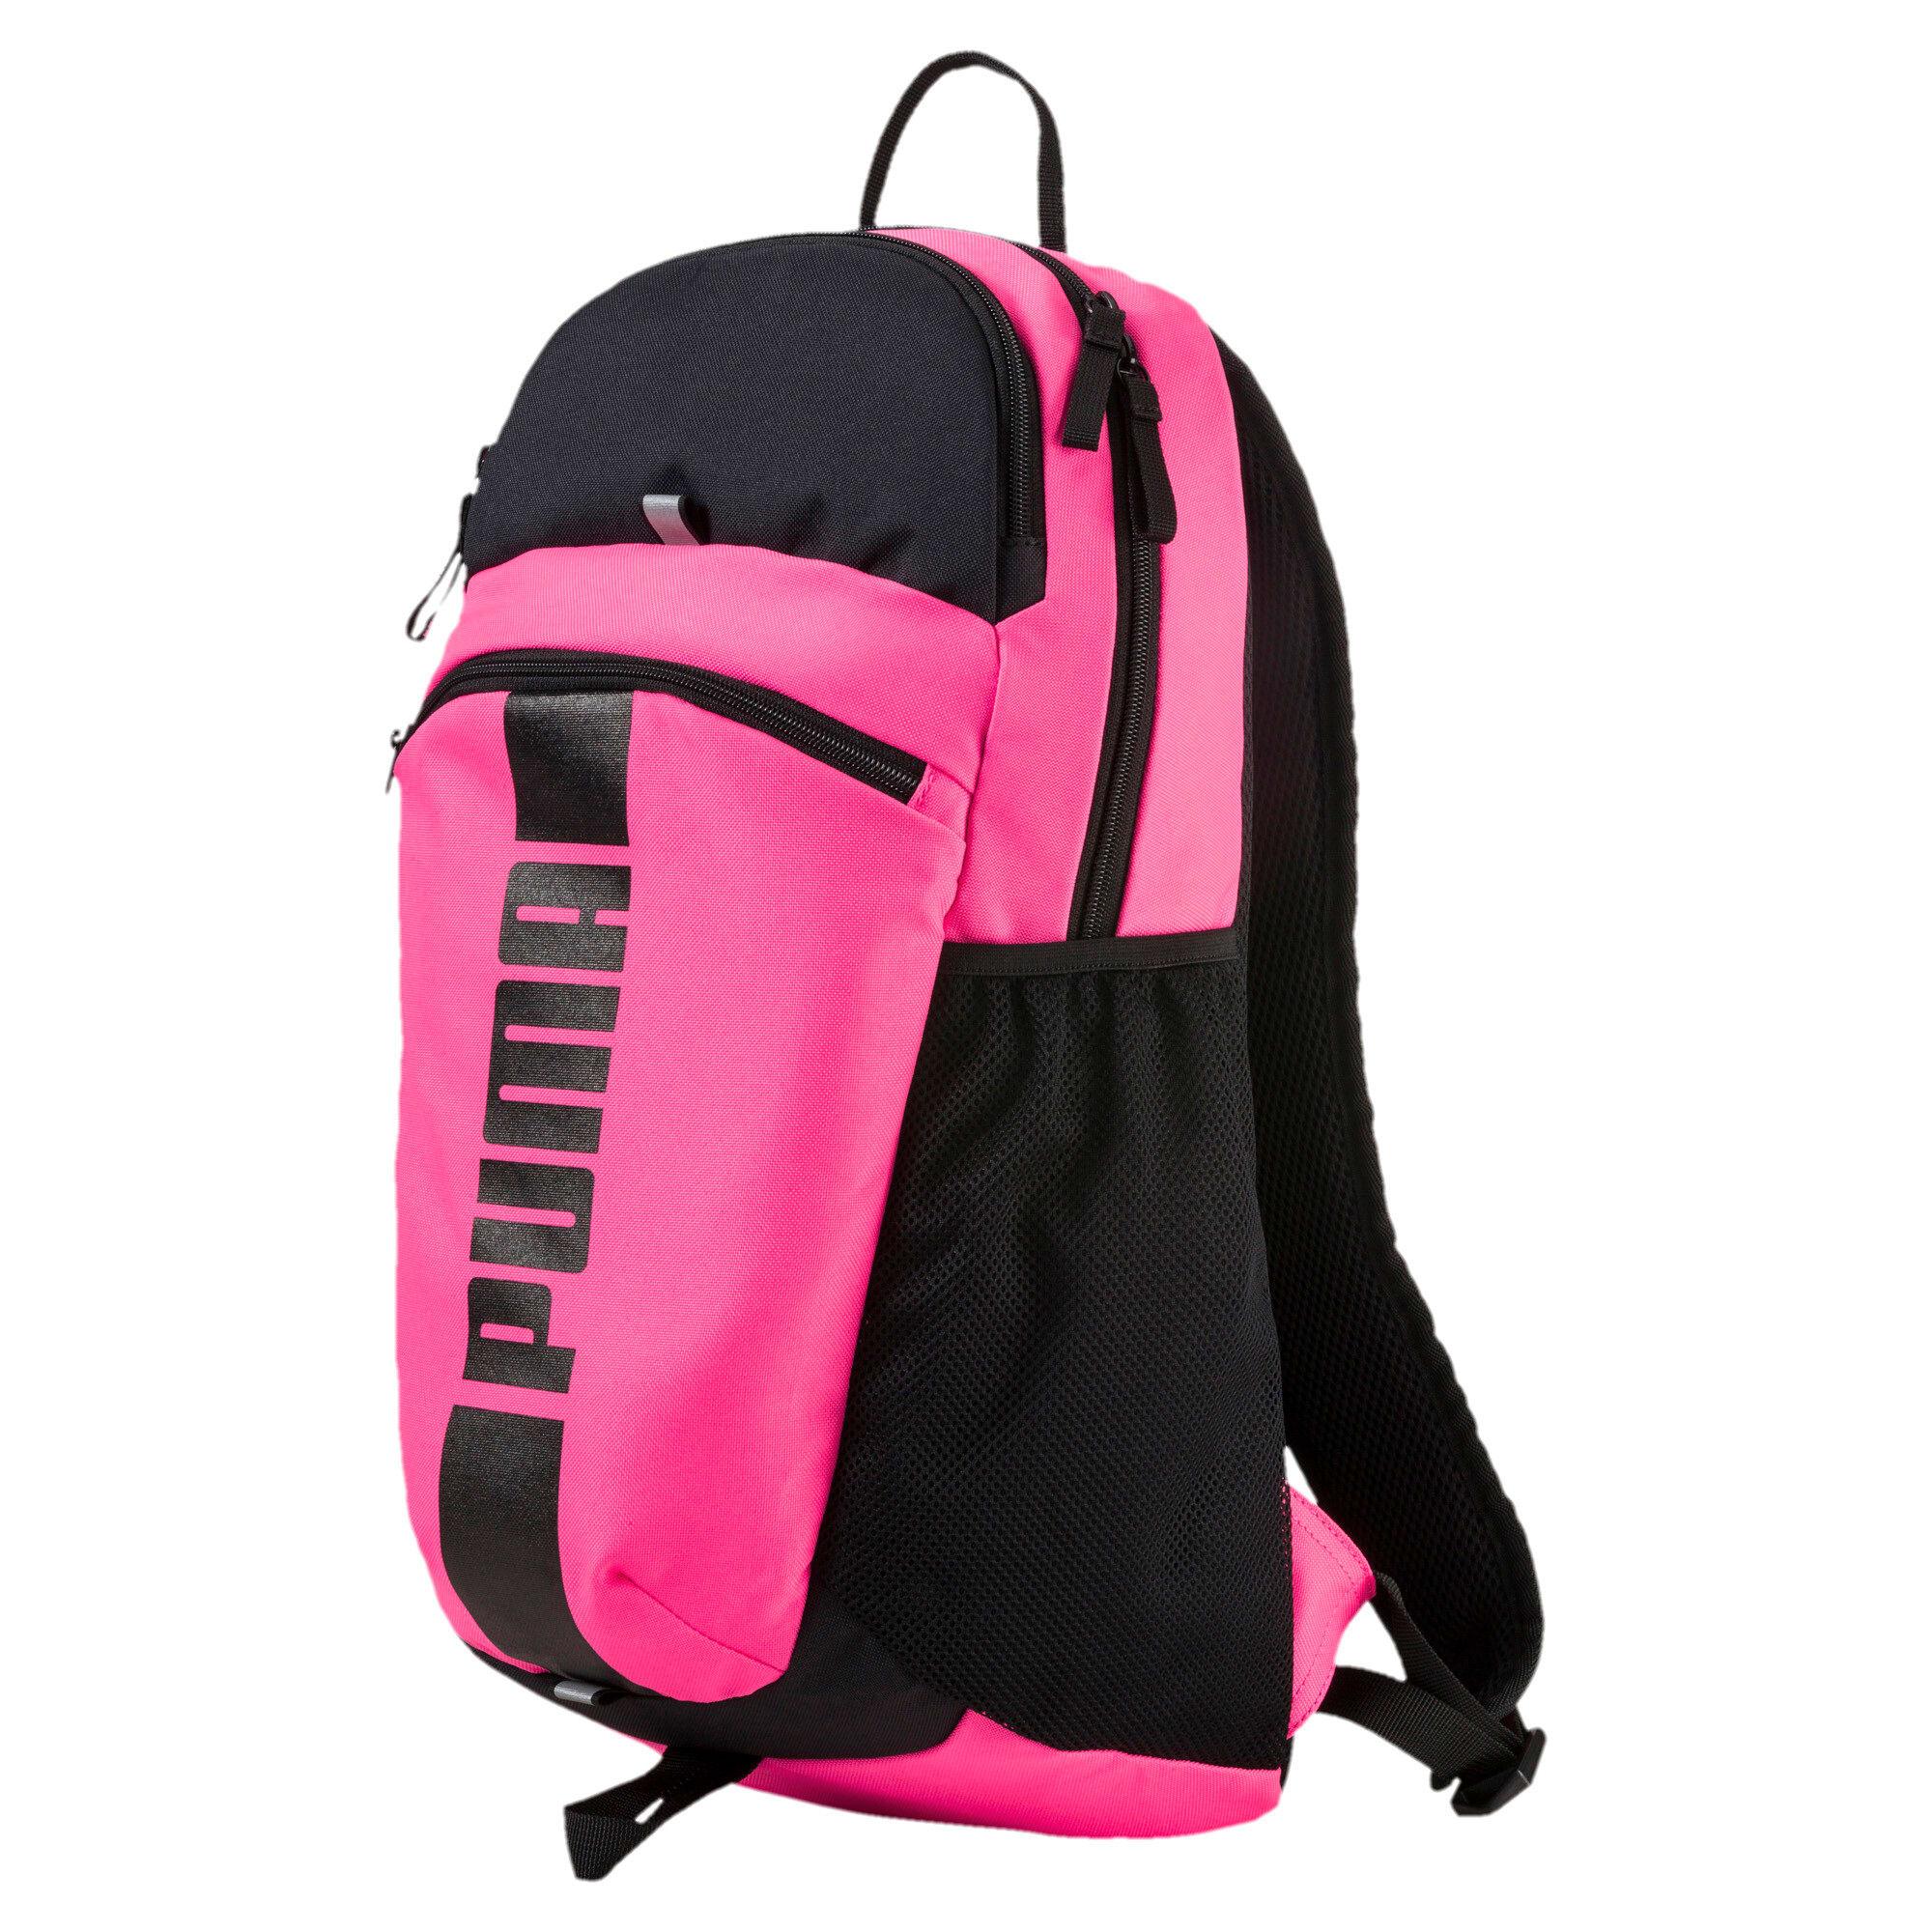 Thumbnail 1 of Deck Backpack II, KNOCKOUT PINK-Puma Black, medium-IND